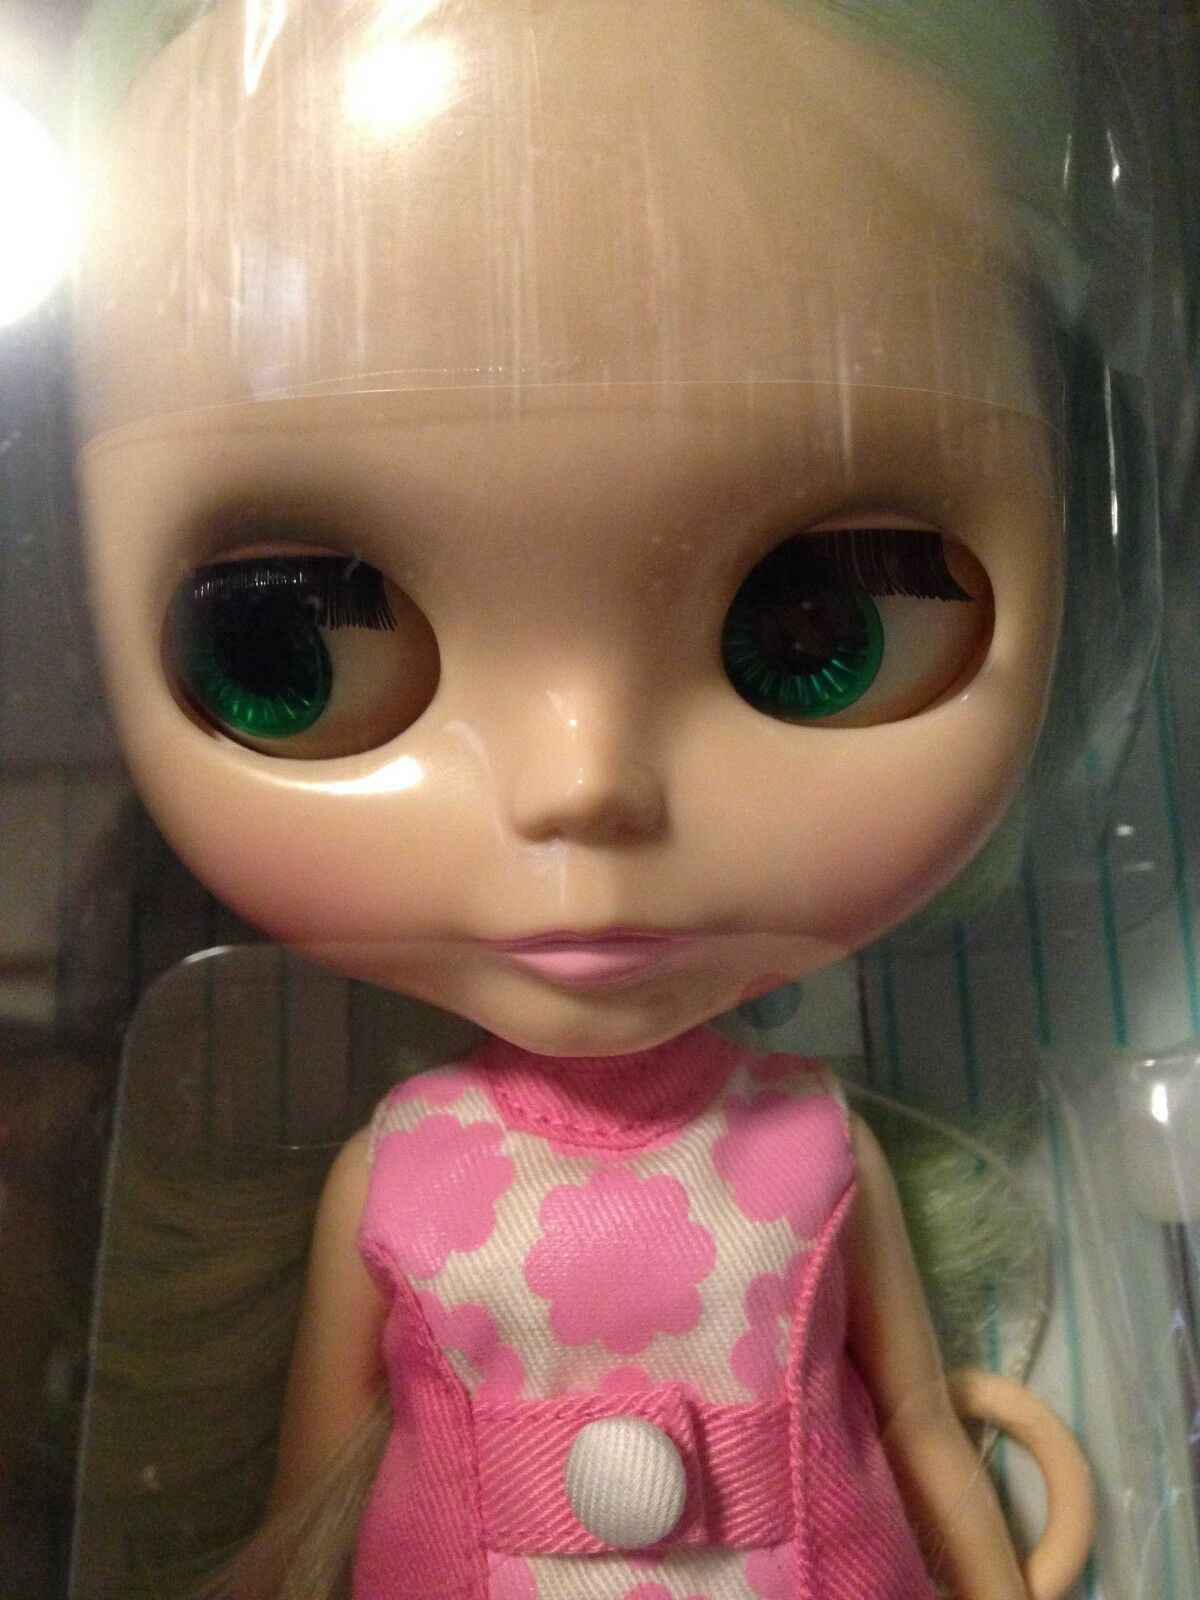 Neo Blythe Doll prima dolly melon Limited 500 Edition F S